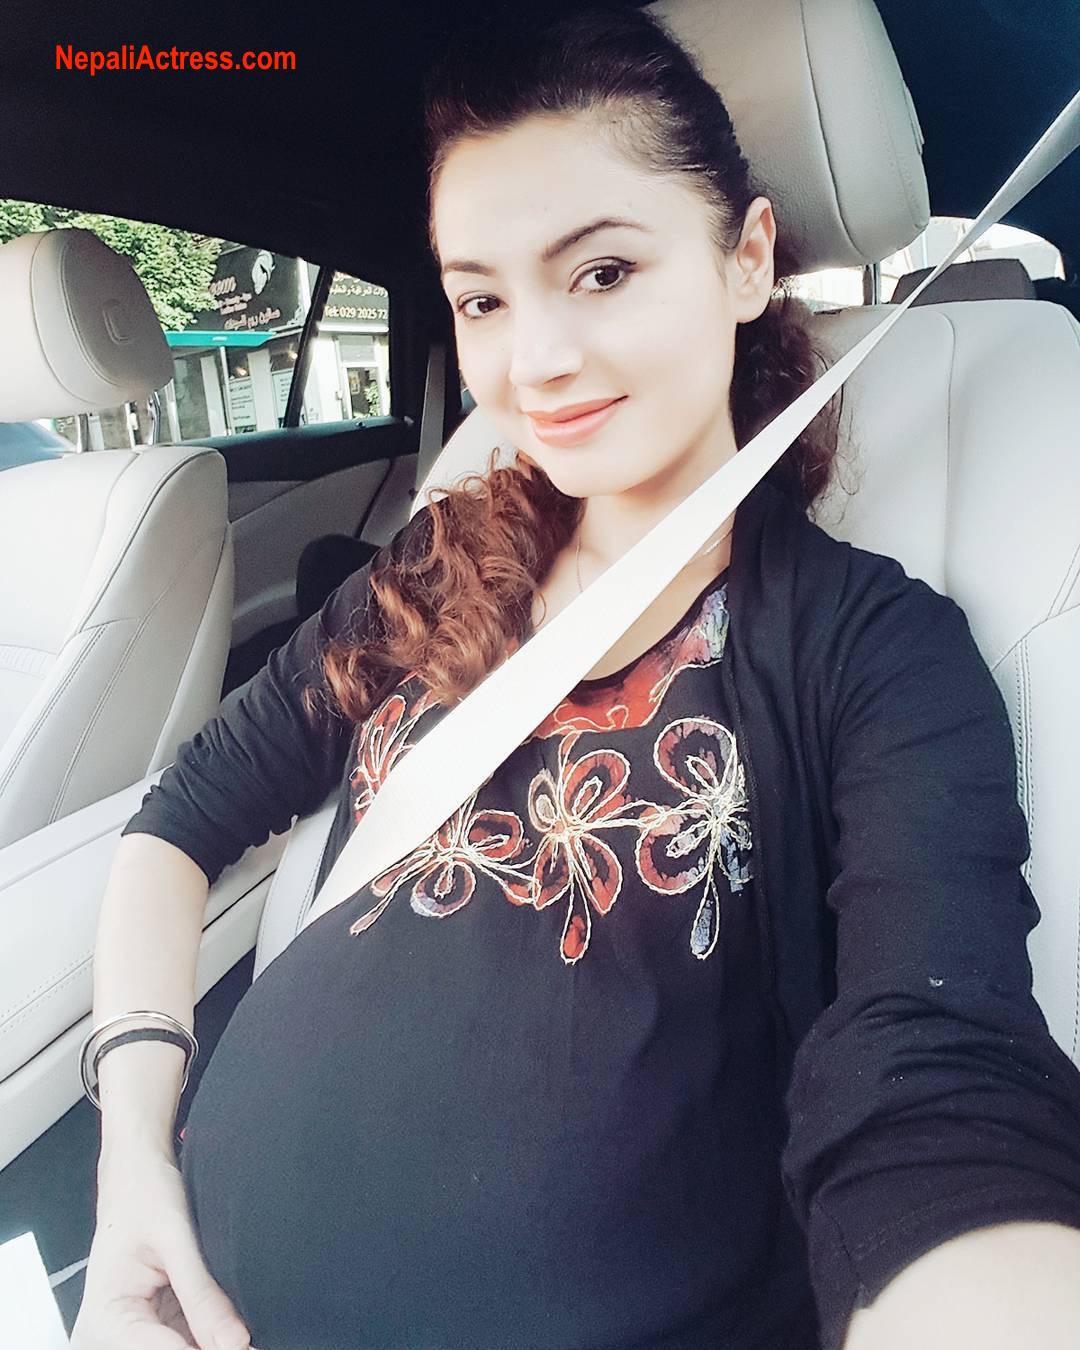 simpal-khanal-pregnant